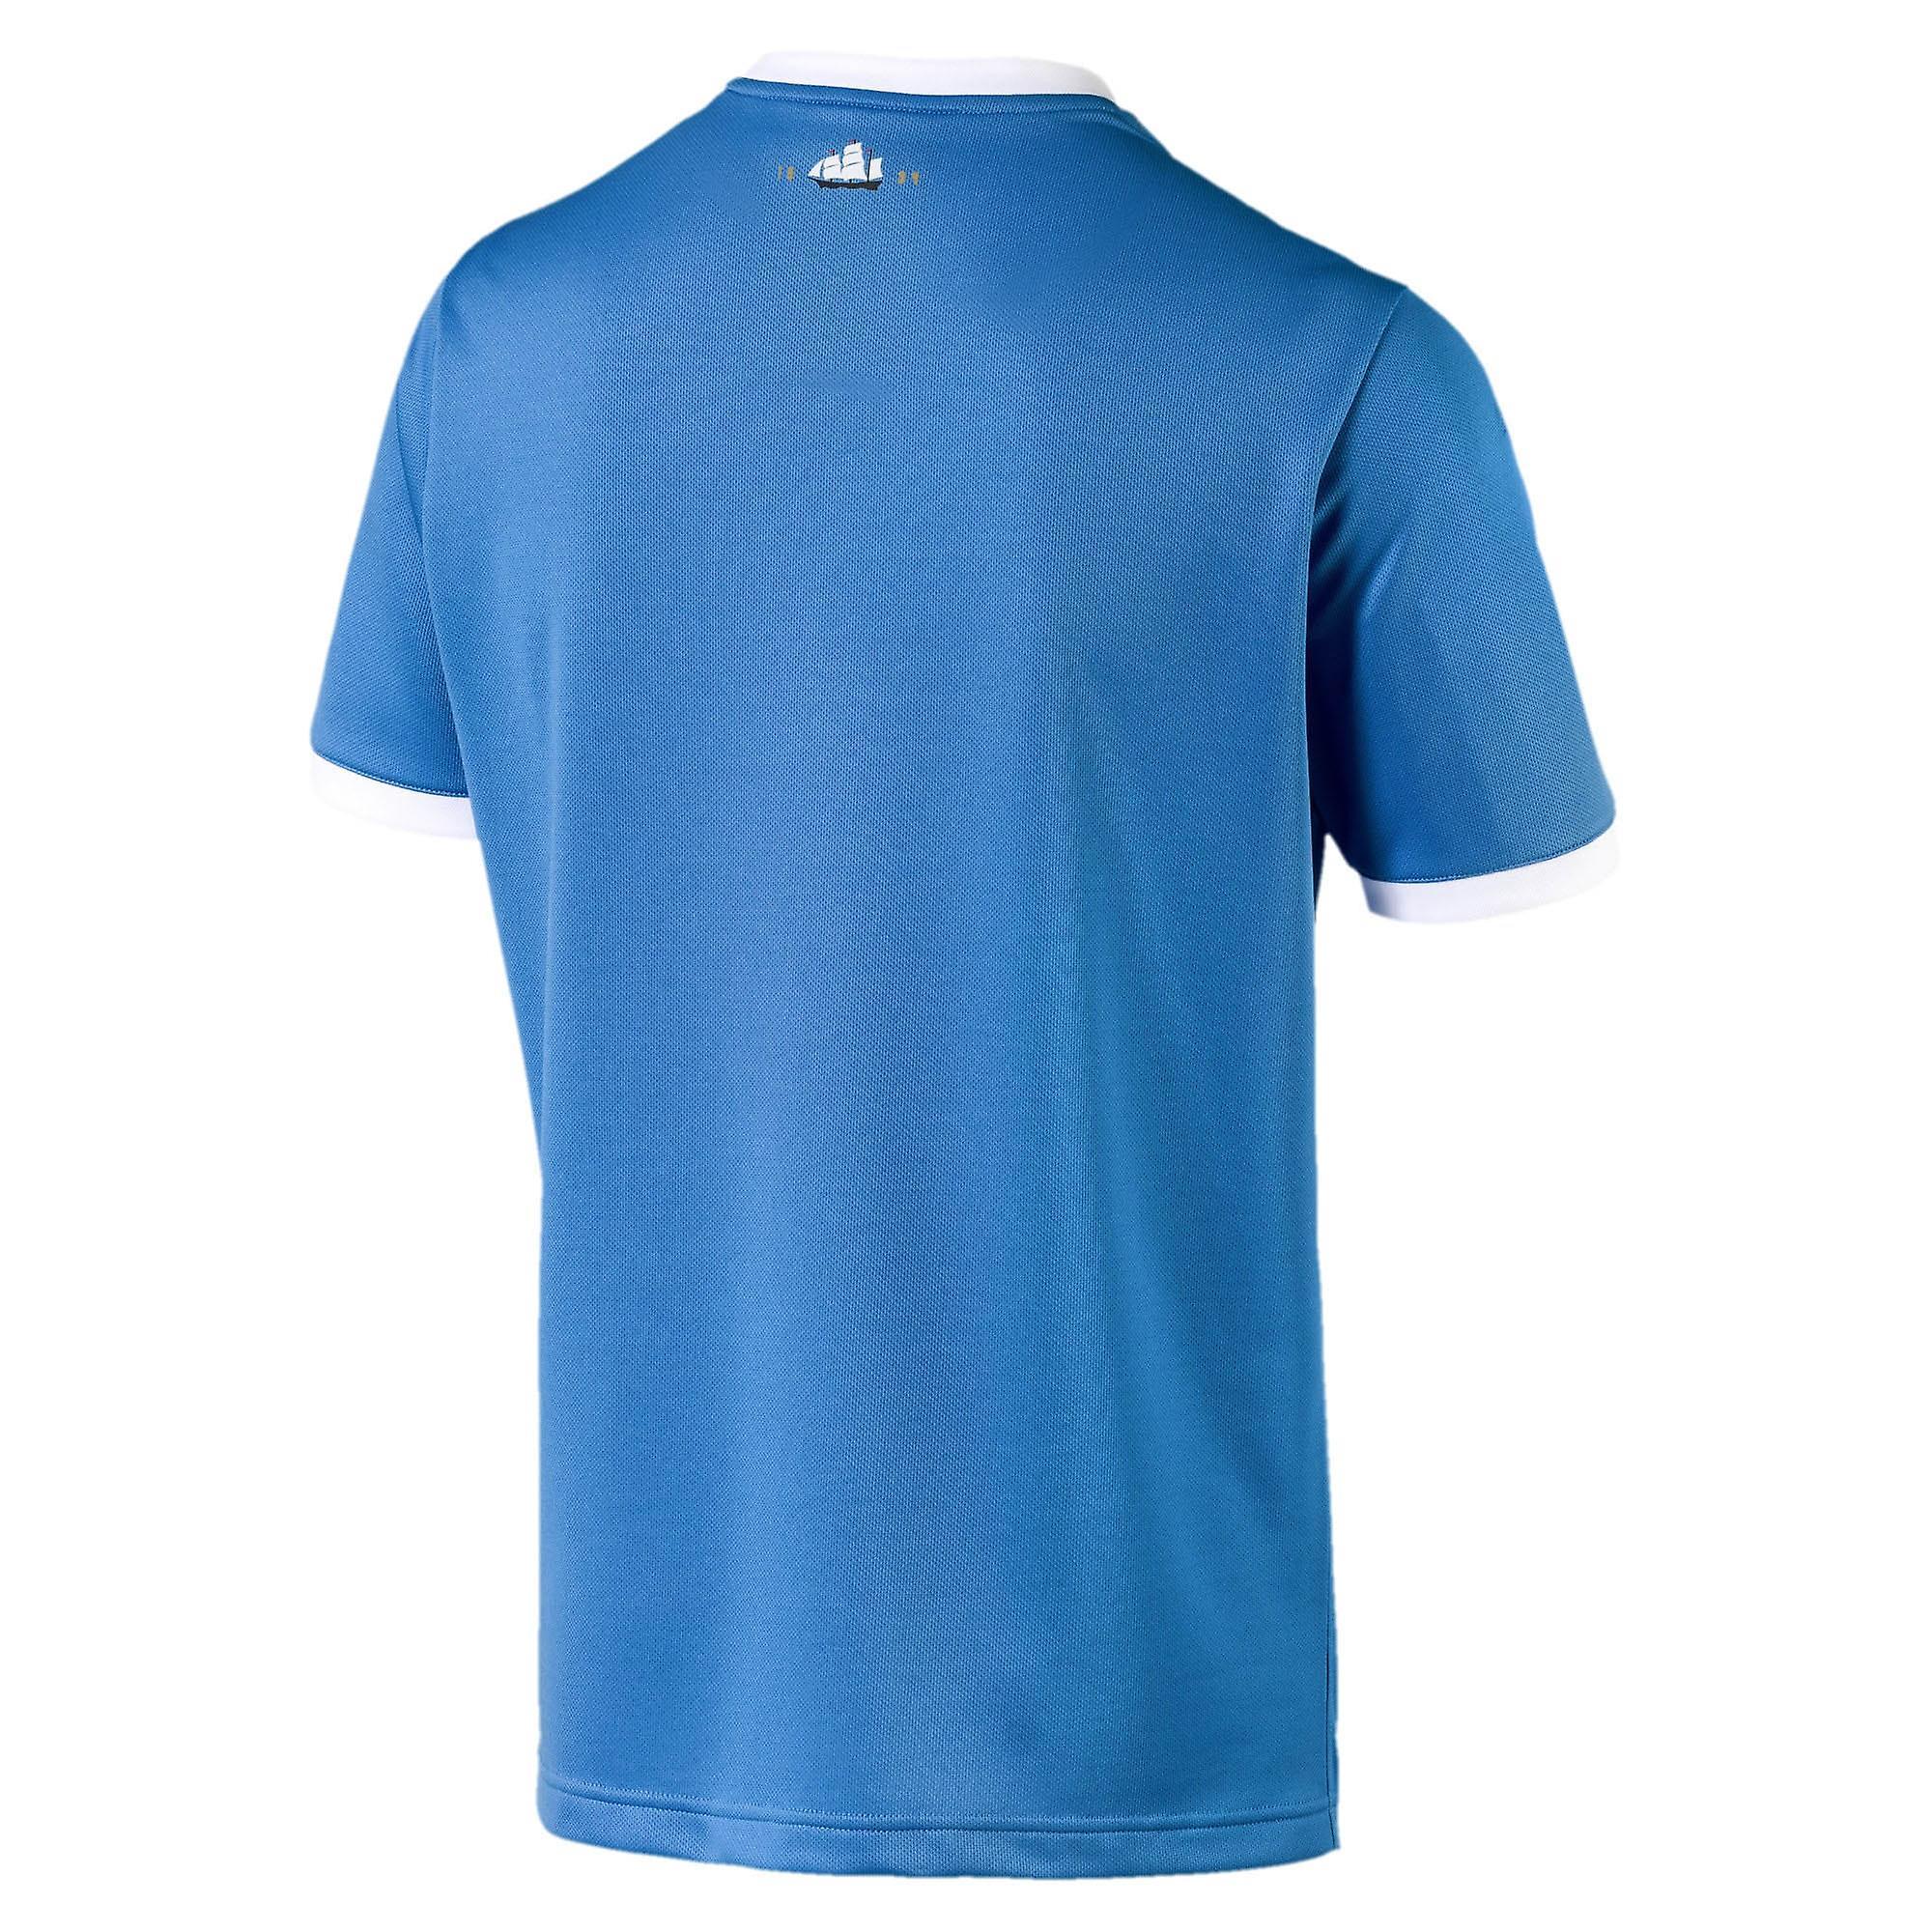 Puma Manchester City 125 Year Anniversary Mens Short Sleeve Football Shirt Blue